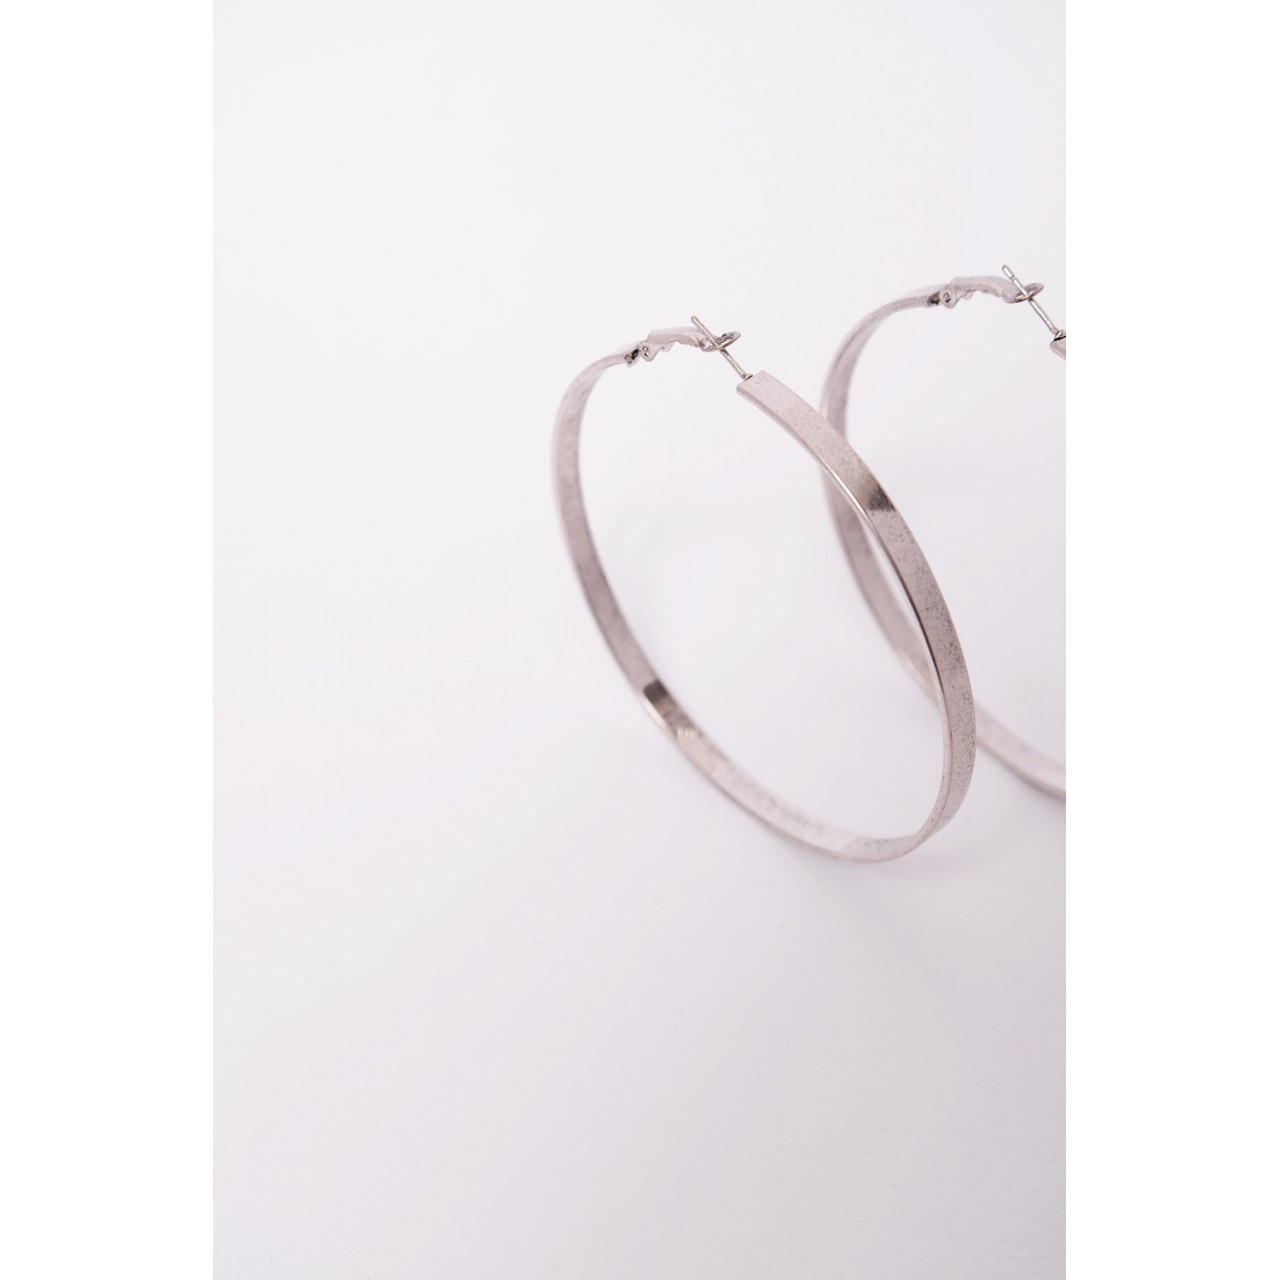 Large linked earings